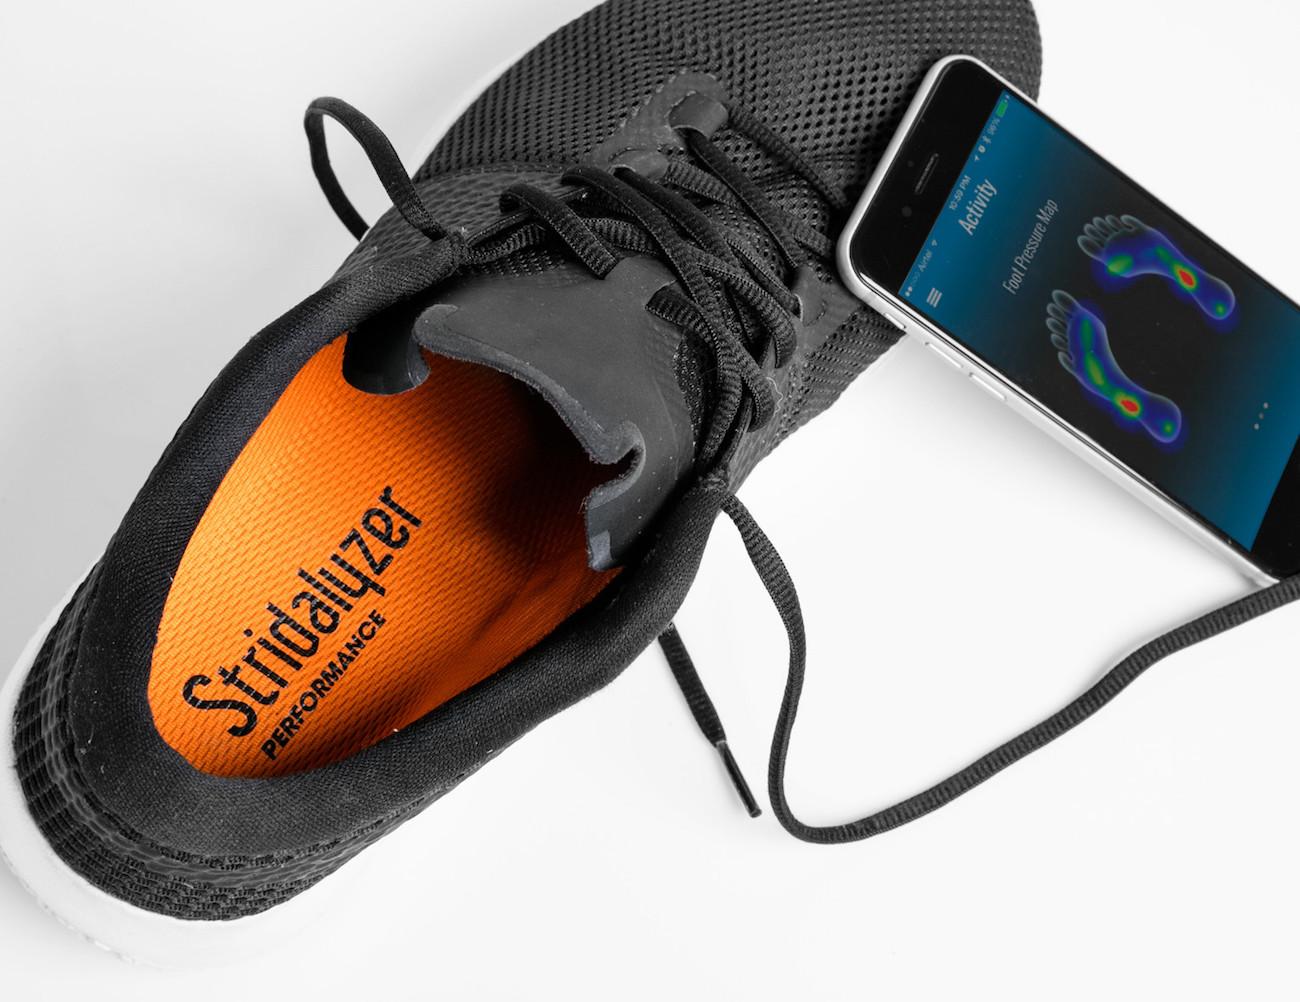 Stridalyzer Performance Smart Insoles